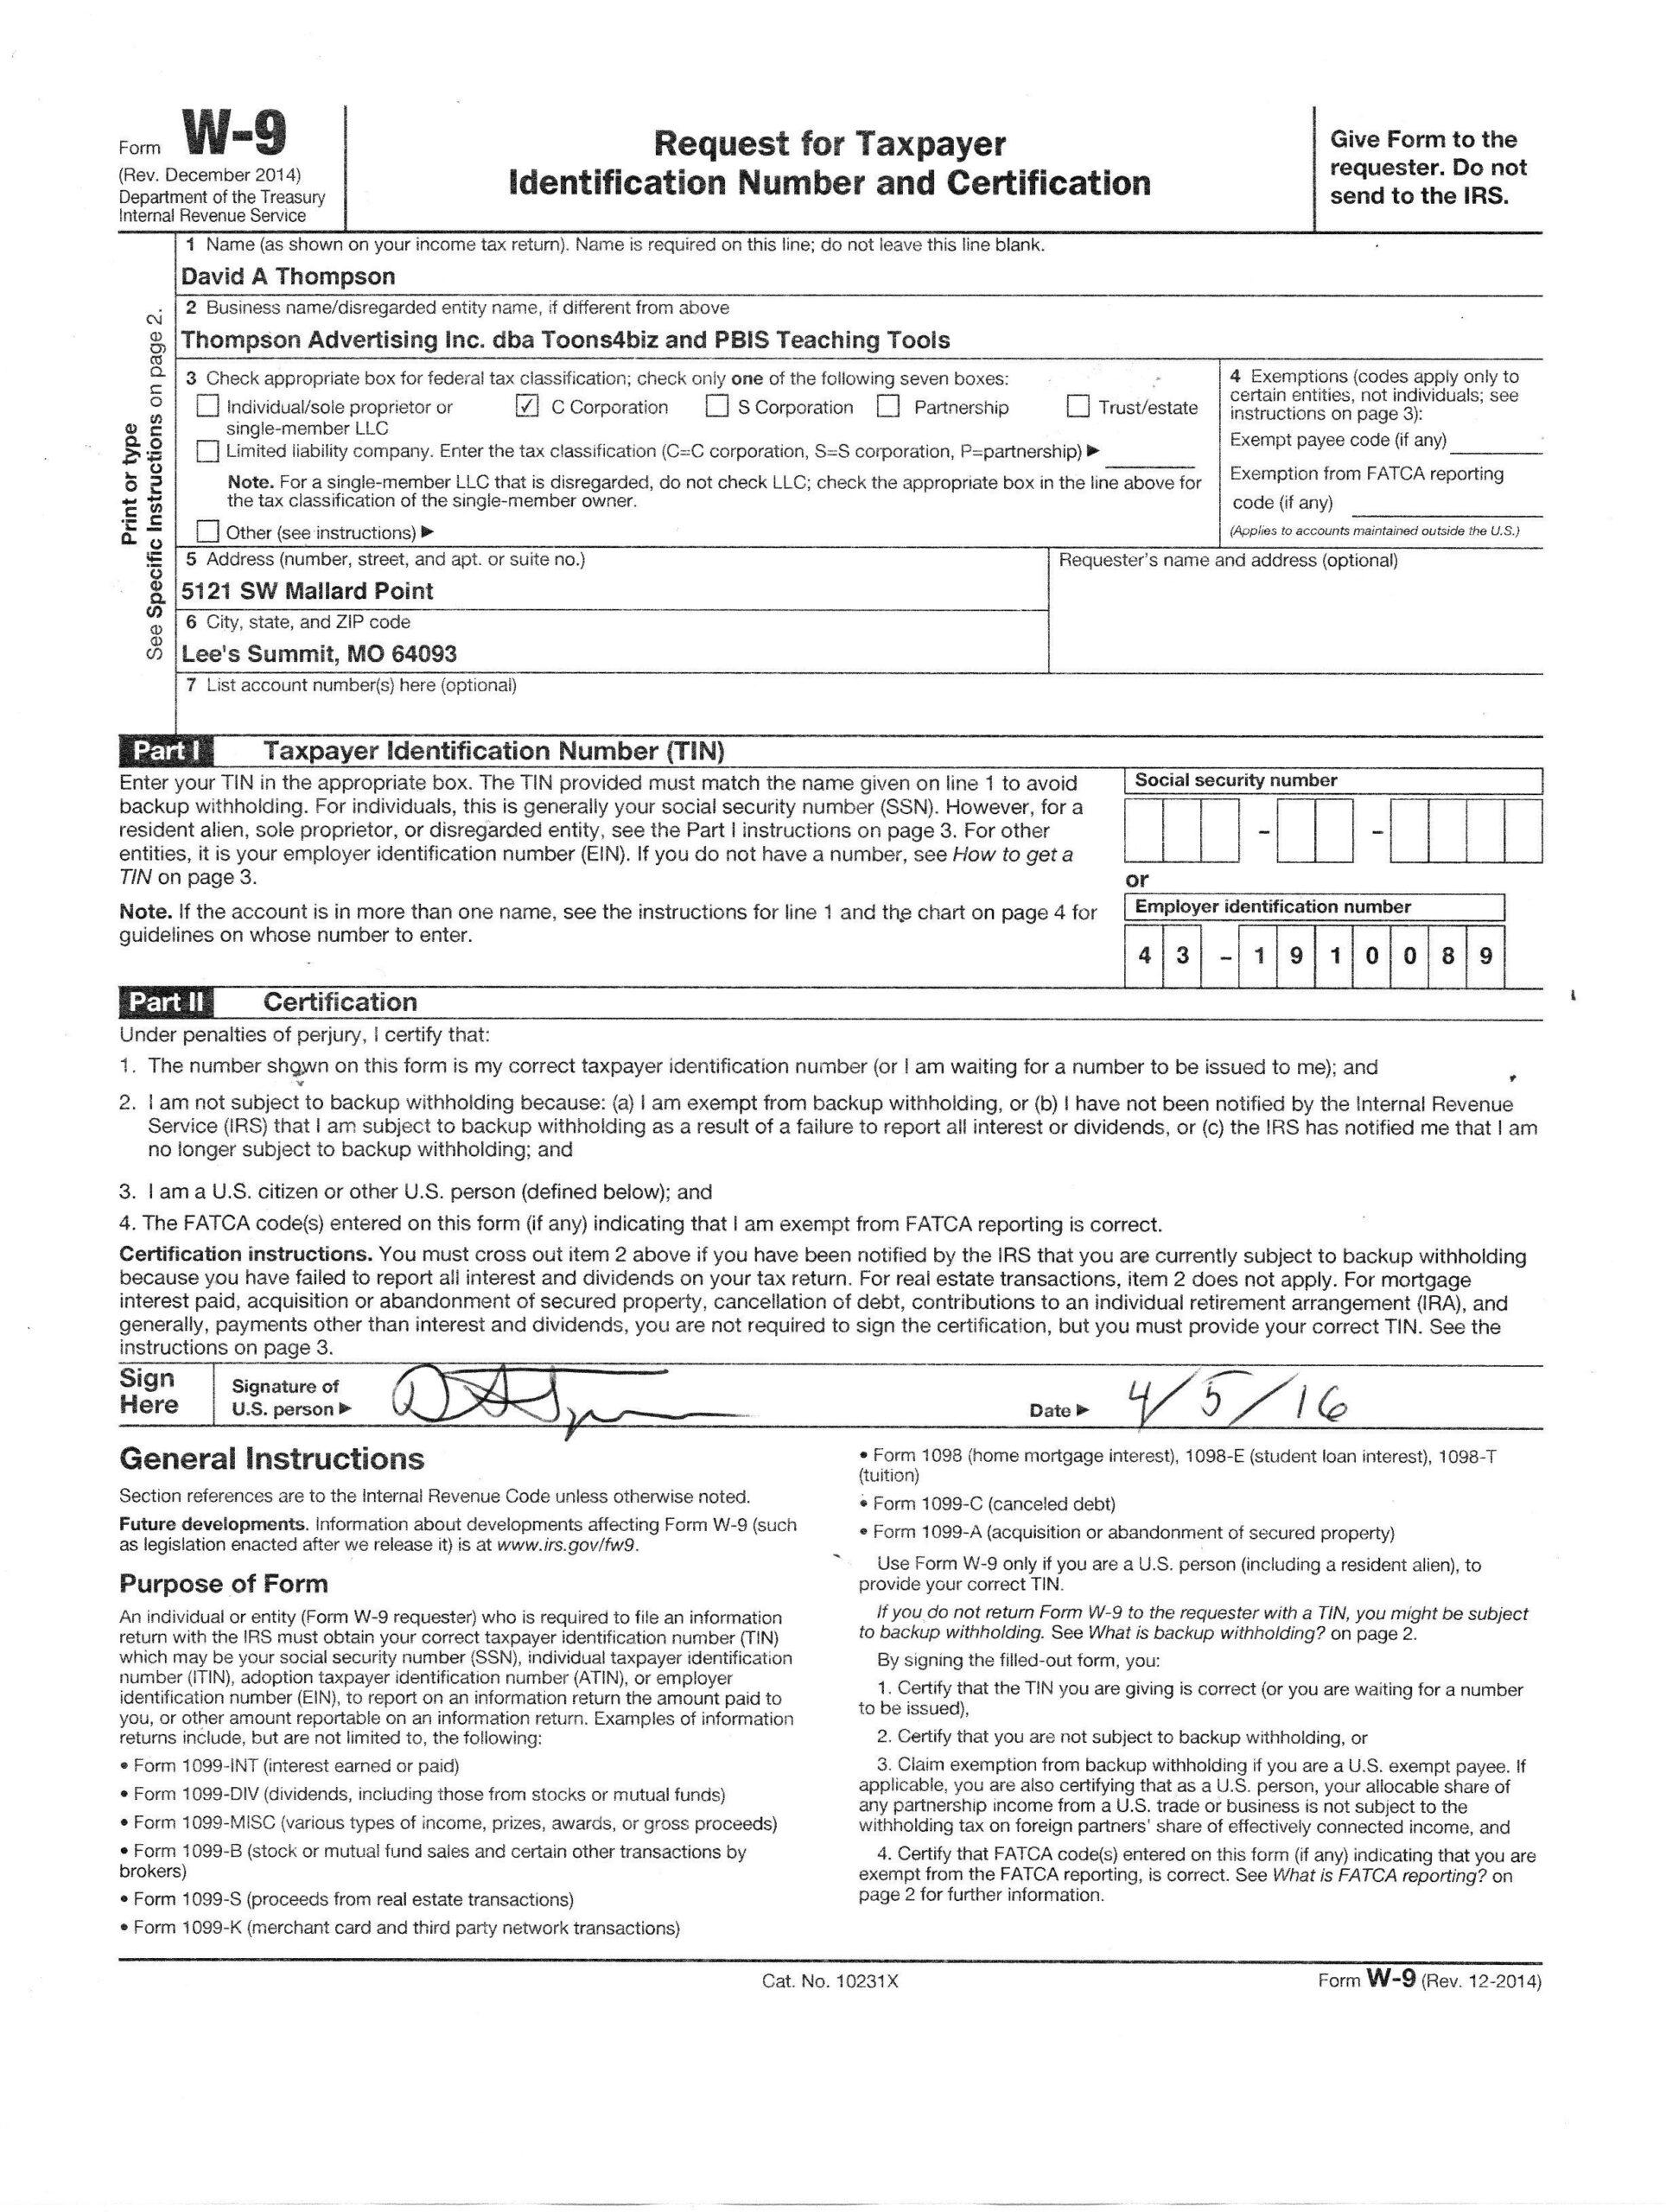 Downloadable W 9 Form W9 Form Mascot Junction In 2020 regarding Free W 9 Form